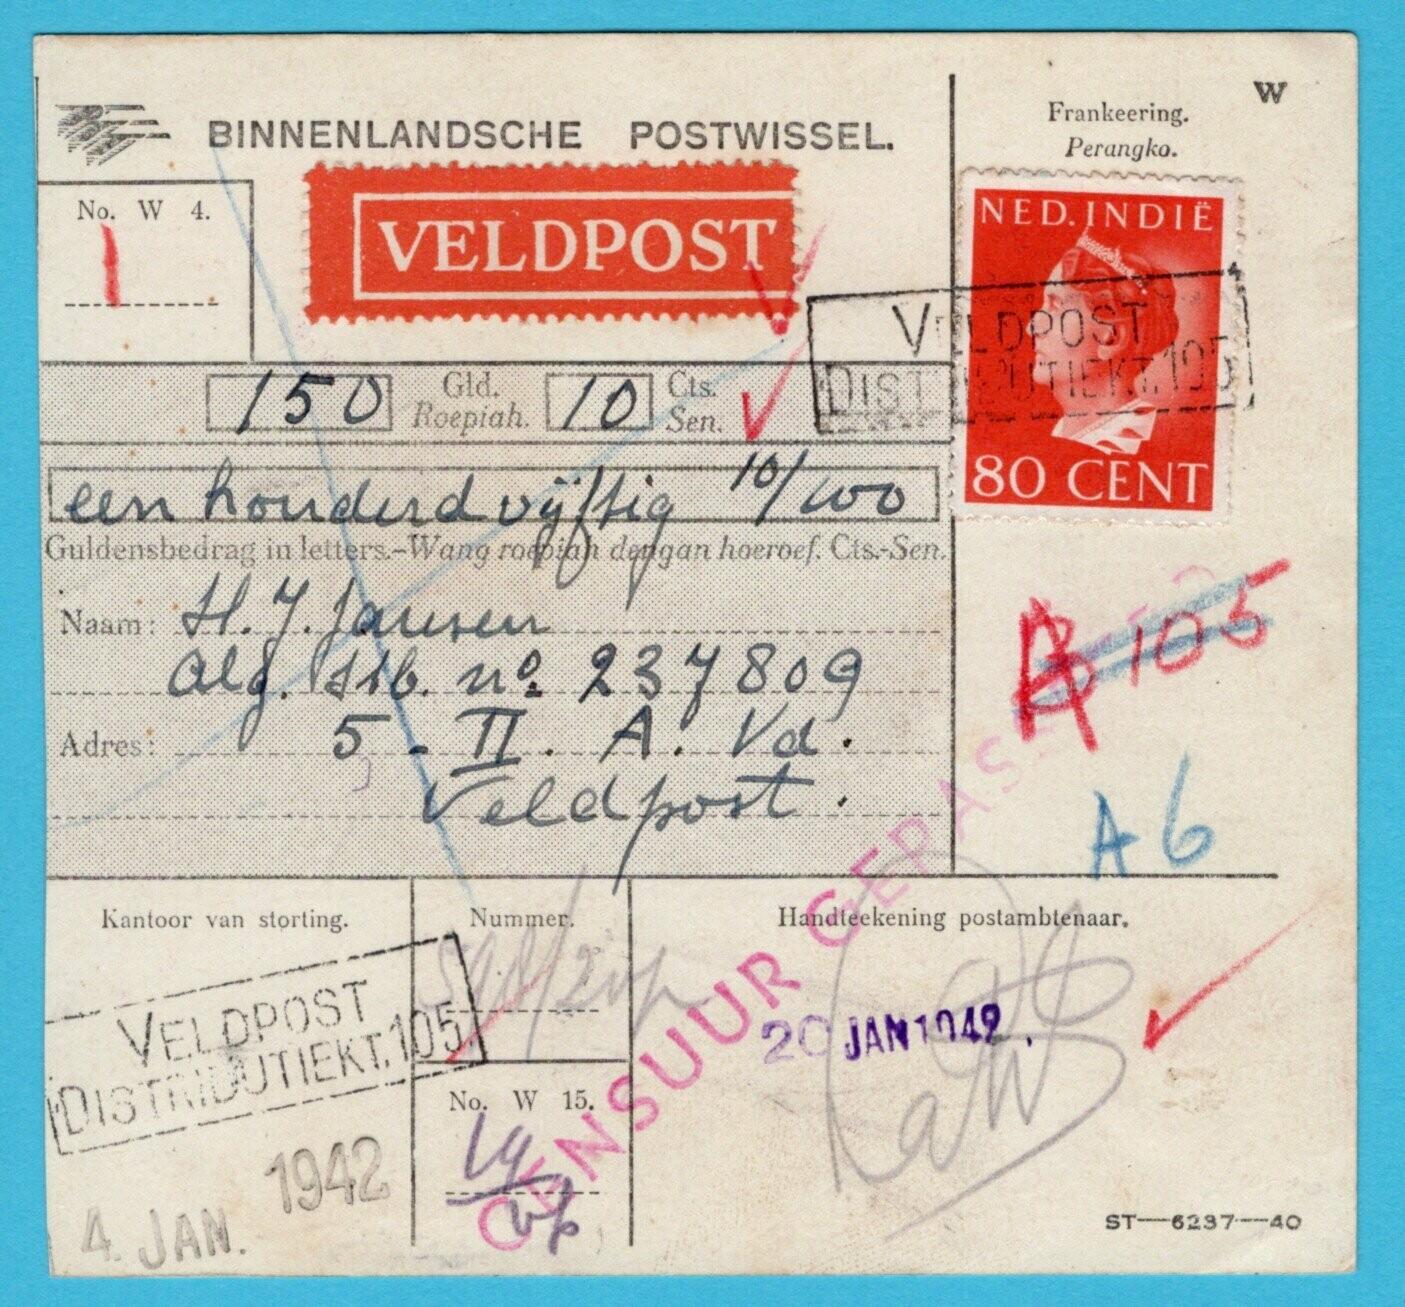 NETHERLANDS EAST INDIES money order 1942 office 105 to fieldpost